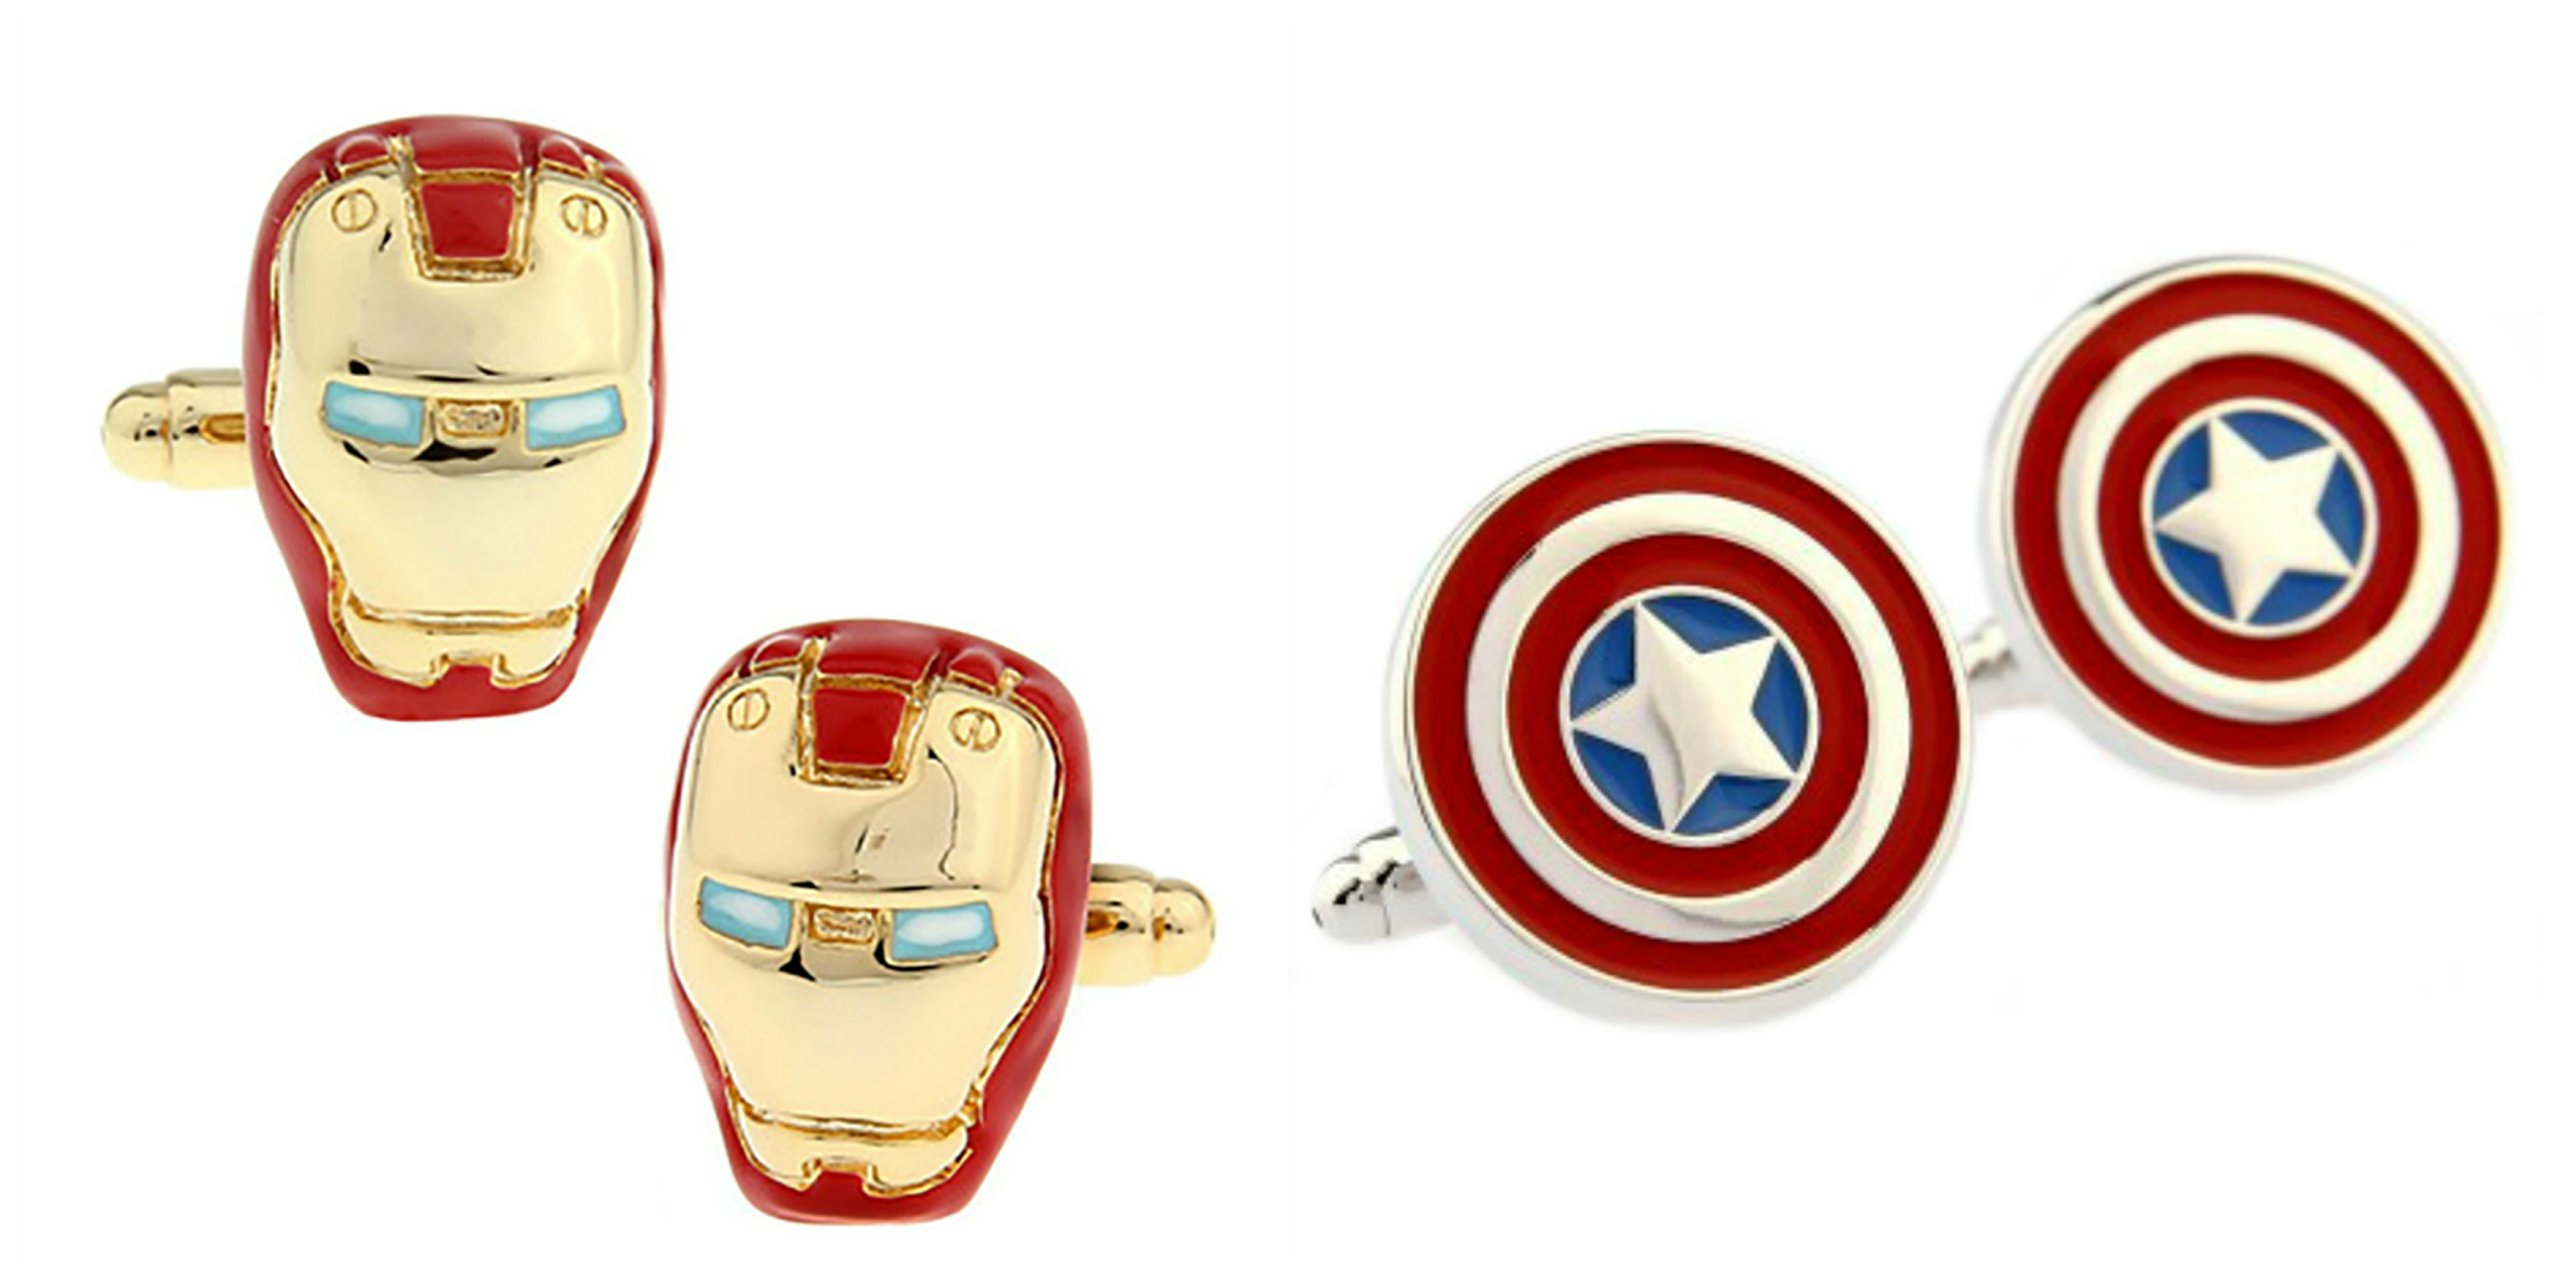 Superheroes Marvel Comics Avengers Captain America And Iron-Man (2 Pair) Cufflinks